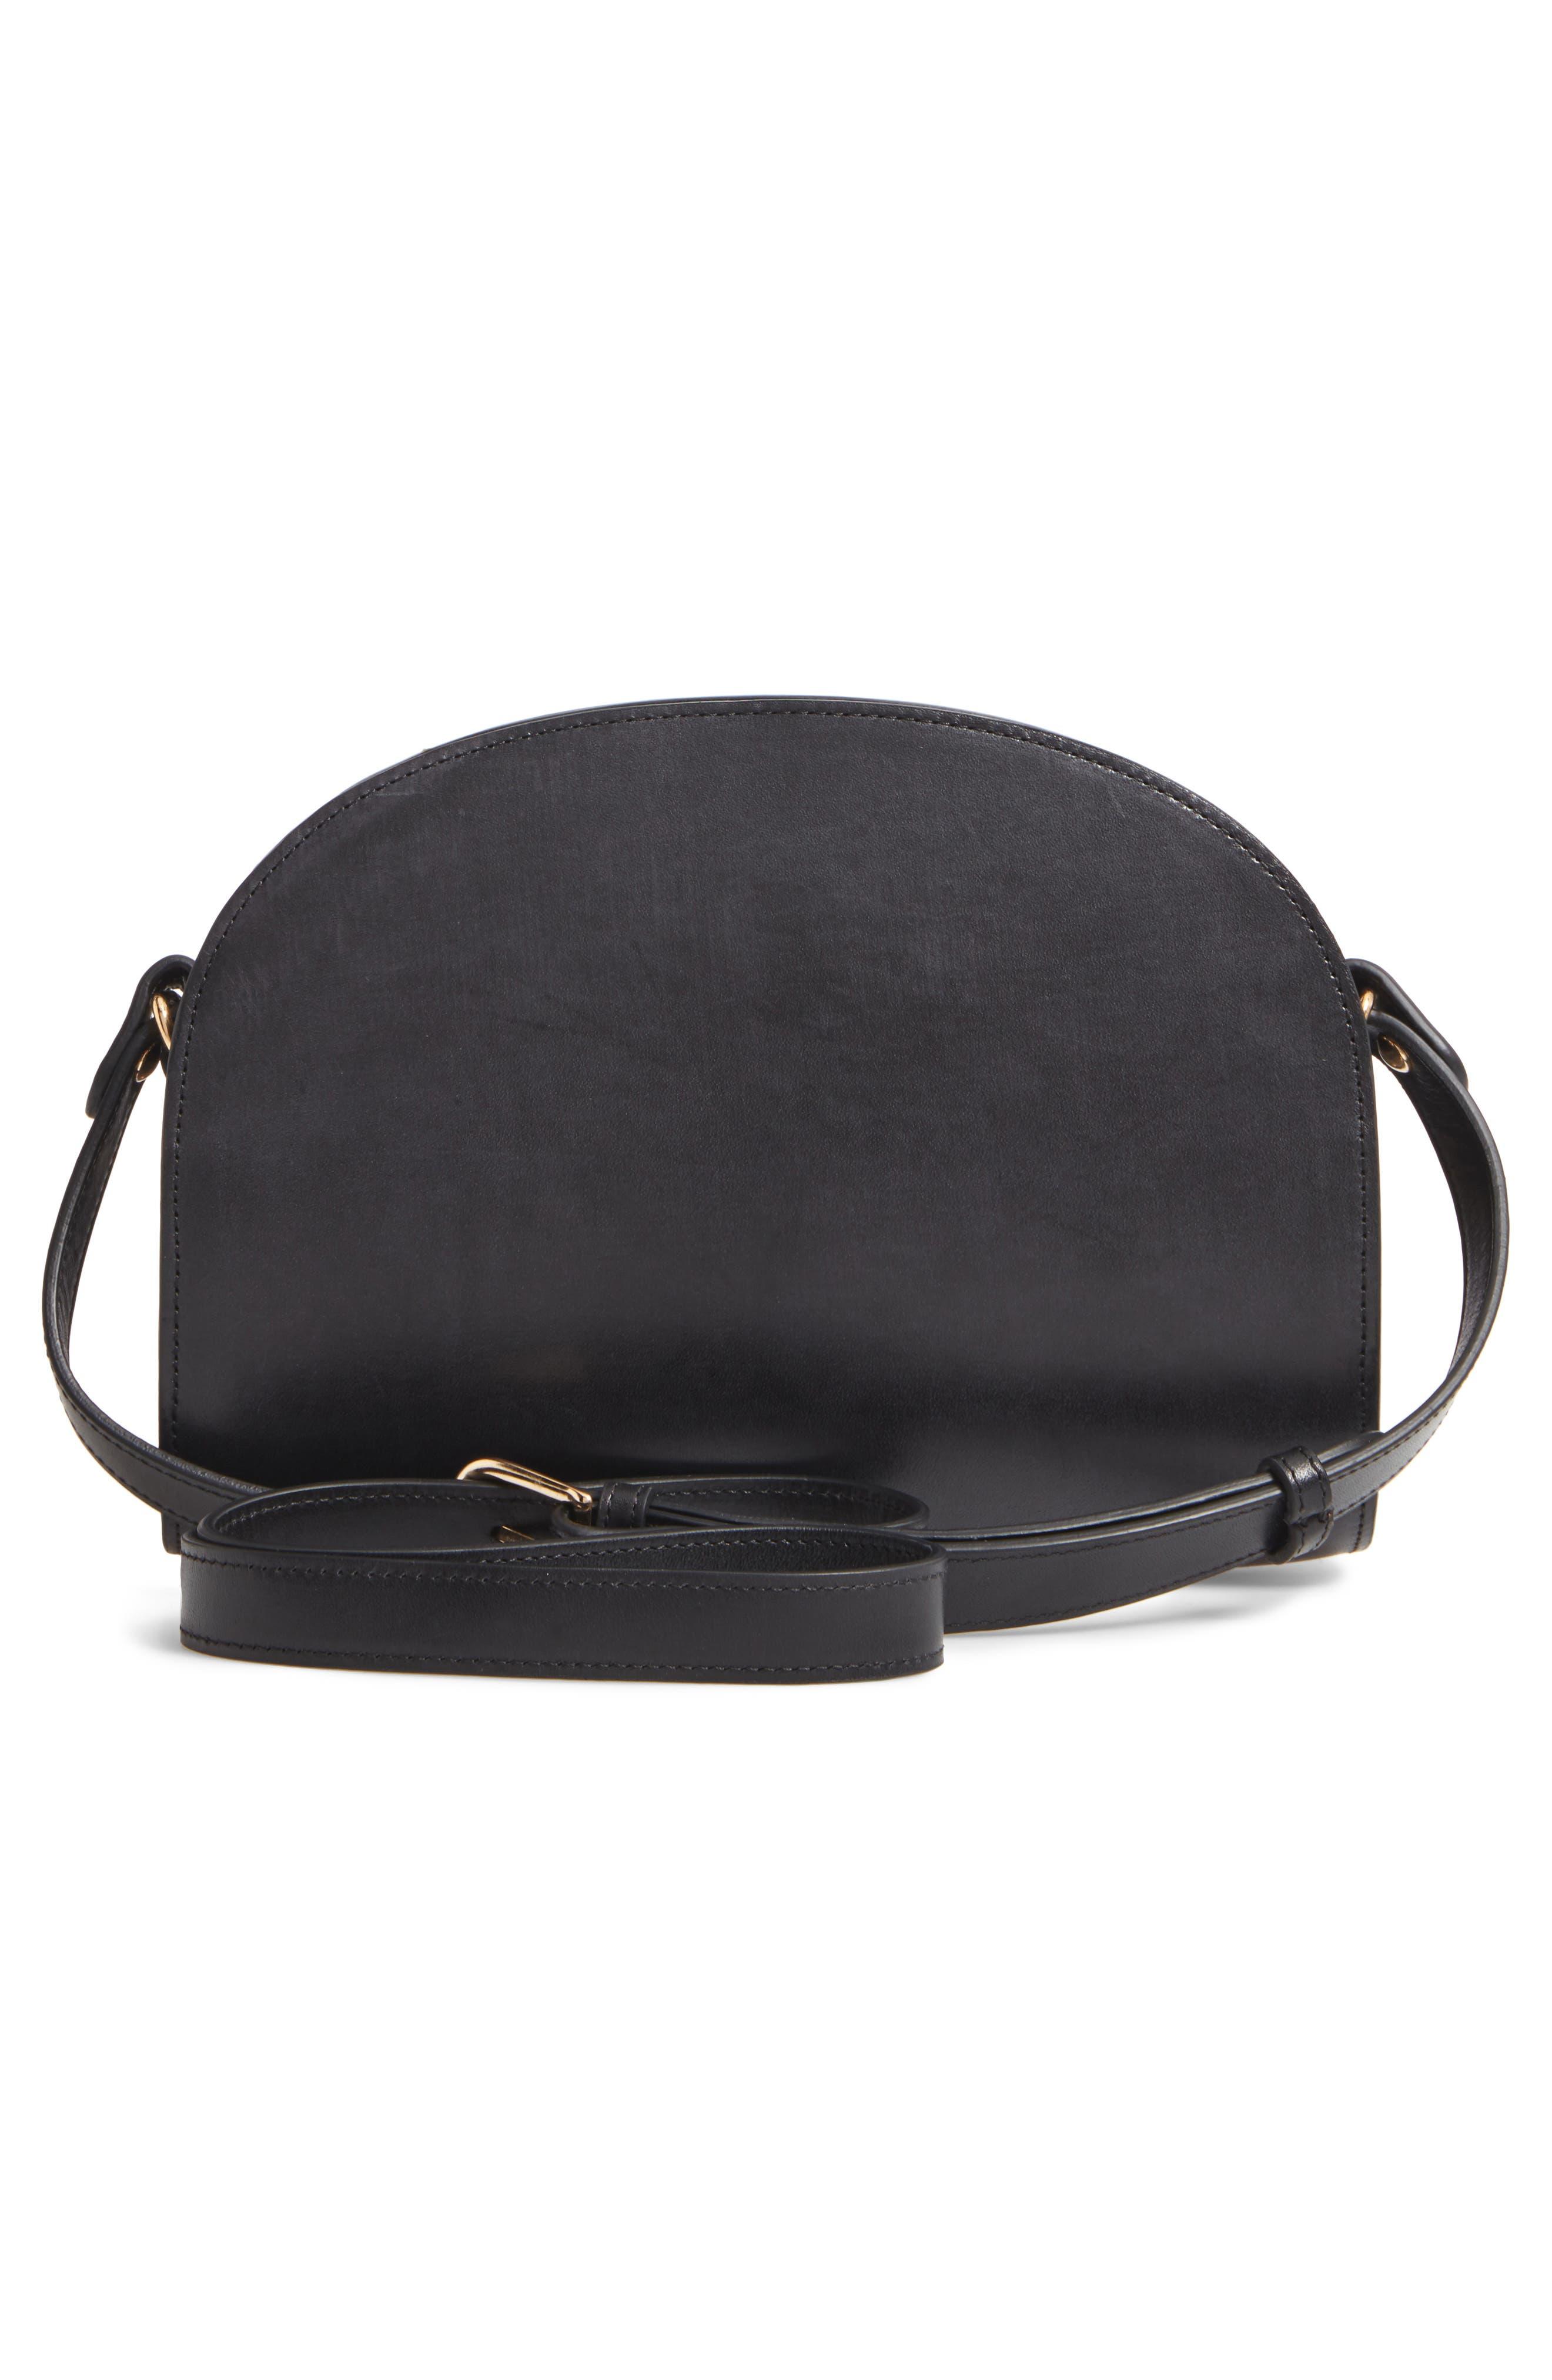 Sac Demi Lune Leather Crossbody Bag,                             Alternate thumbnail 3, color,                             001